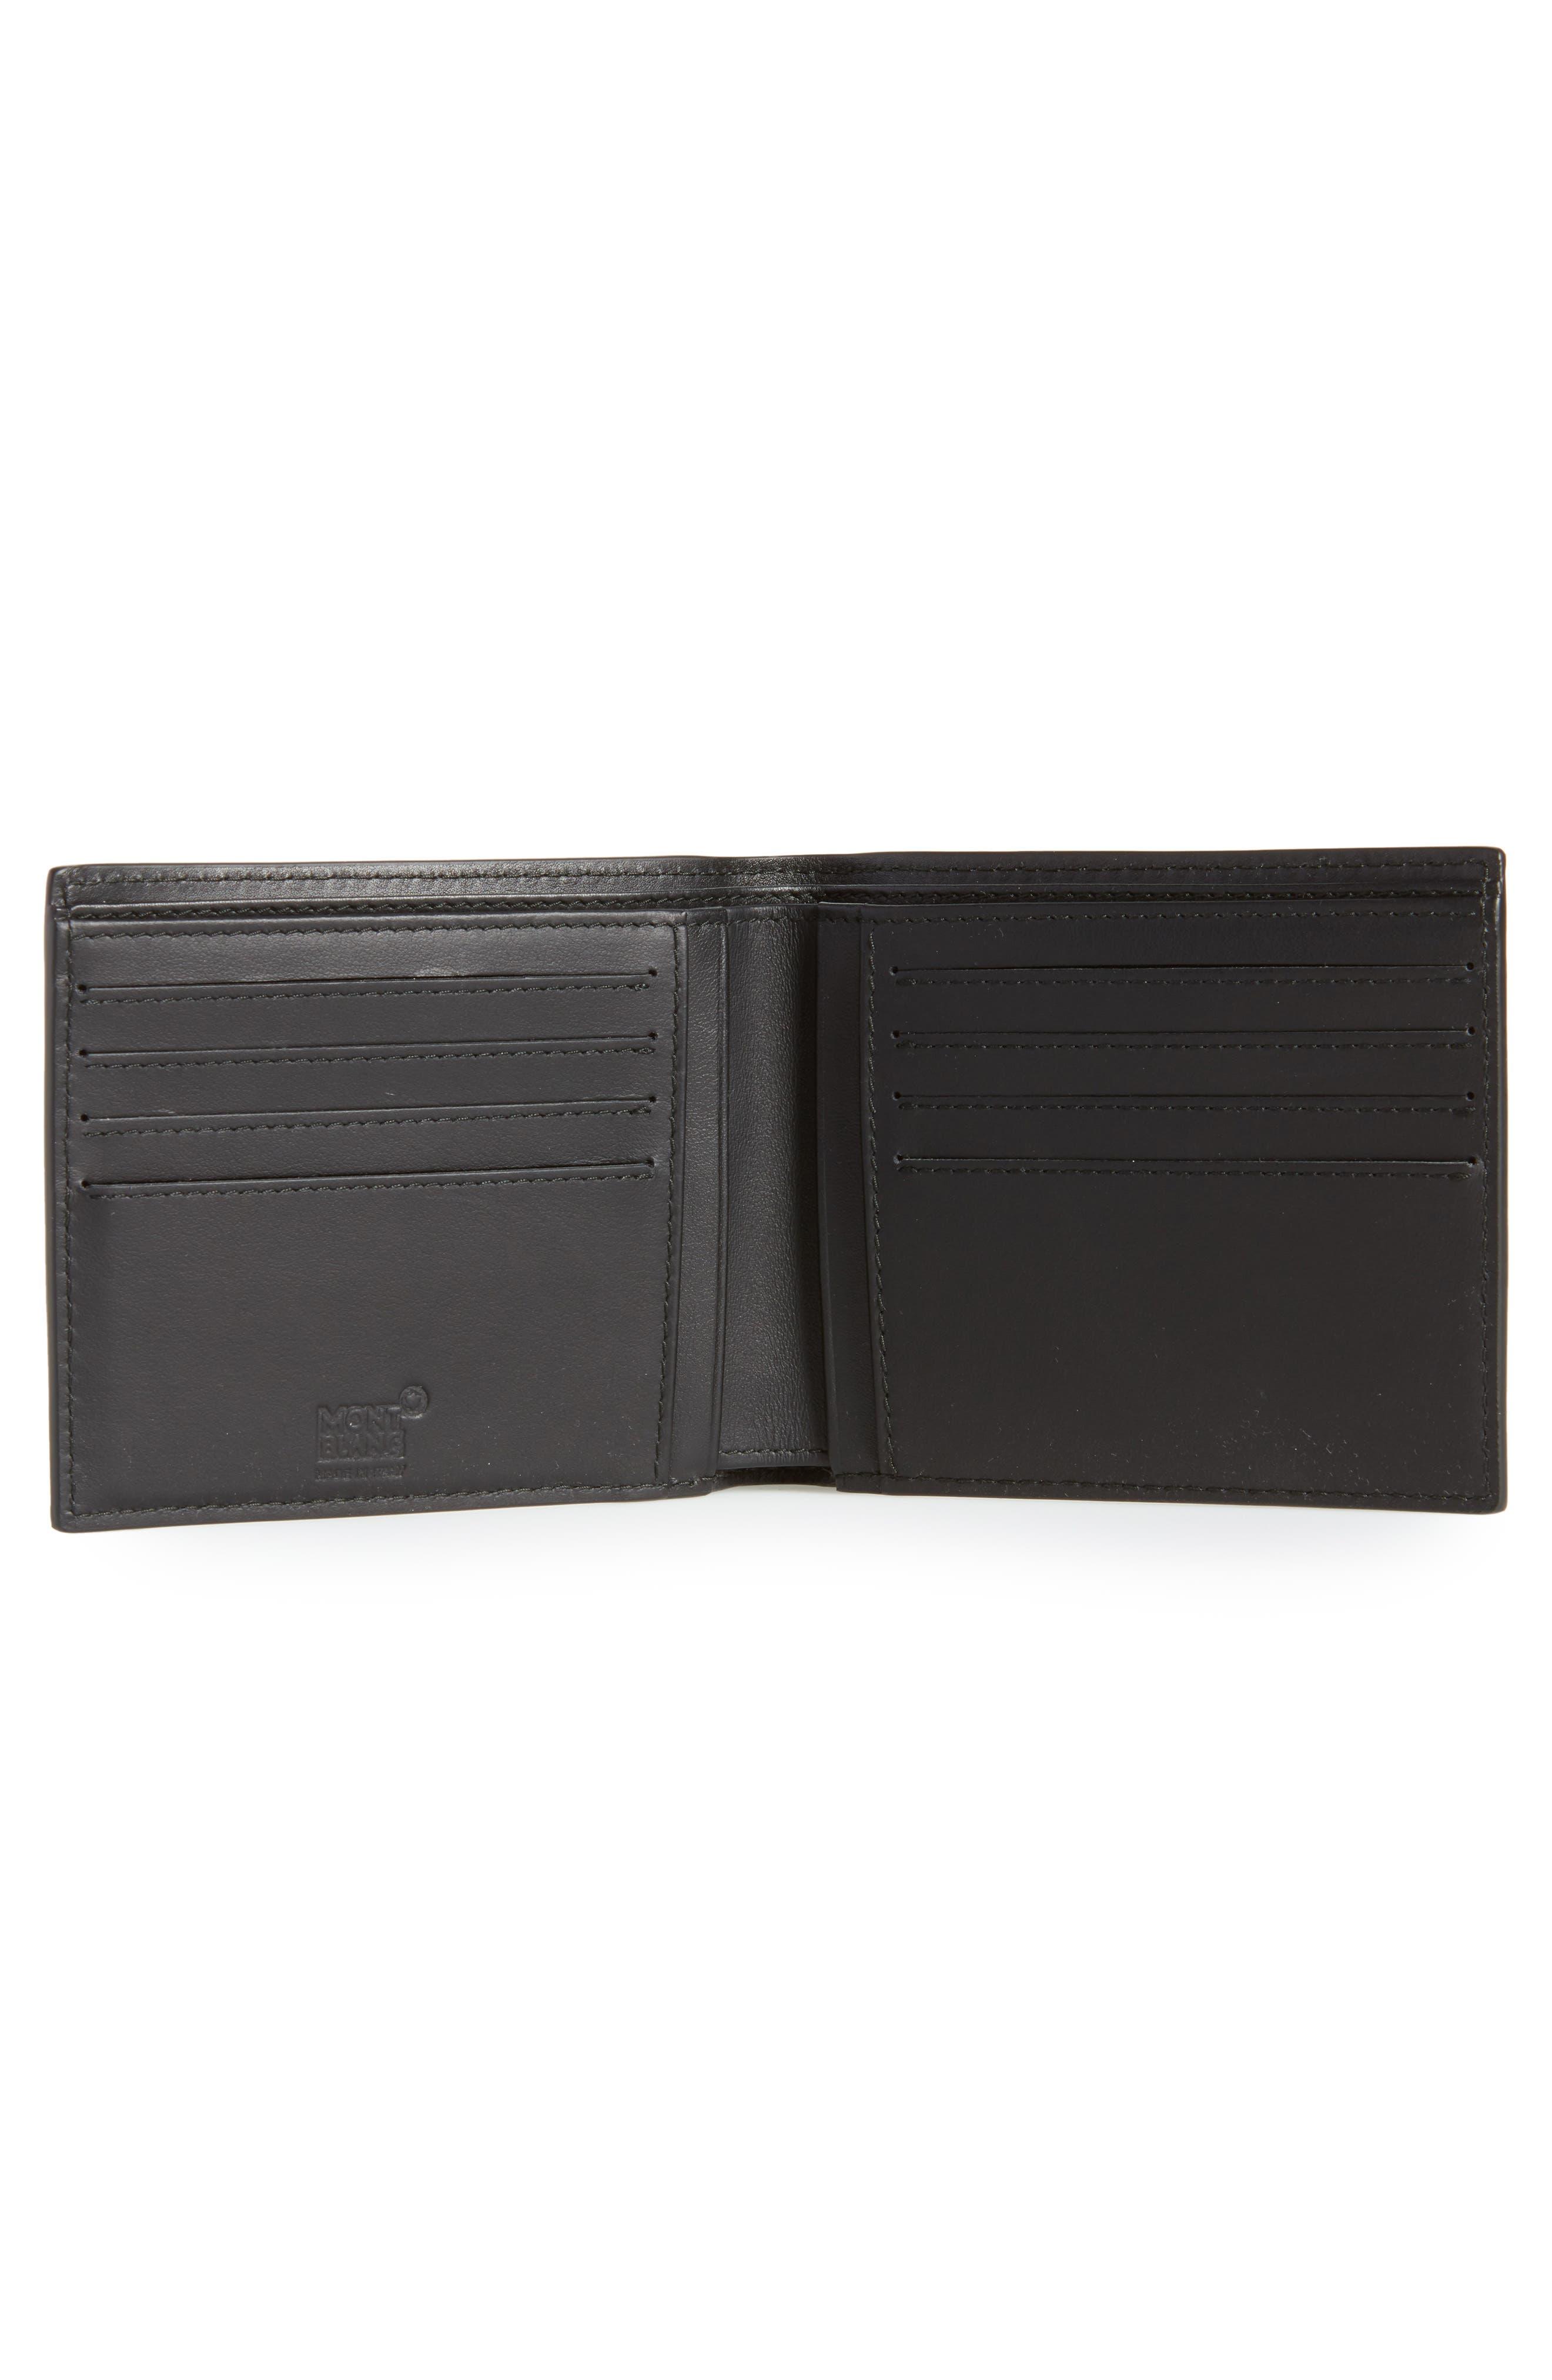 Extreme Leather Wallet,                             Alternate thumbnail 2, color,                             BLACK